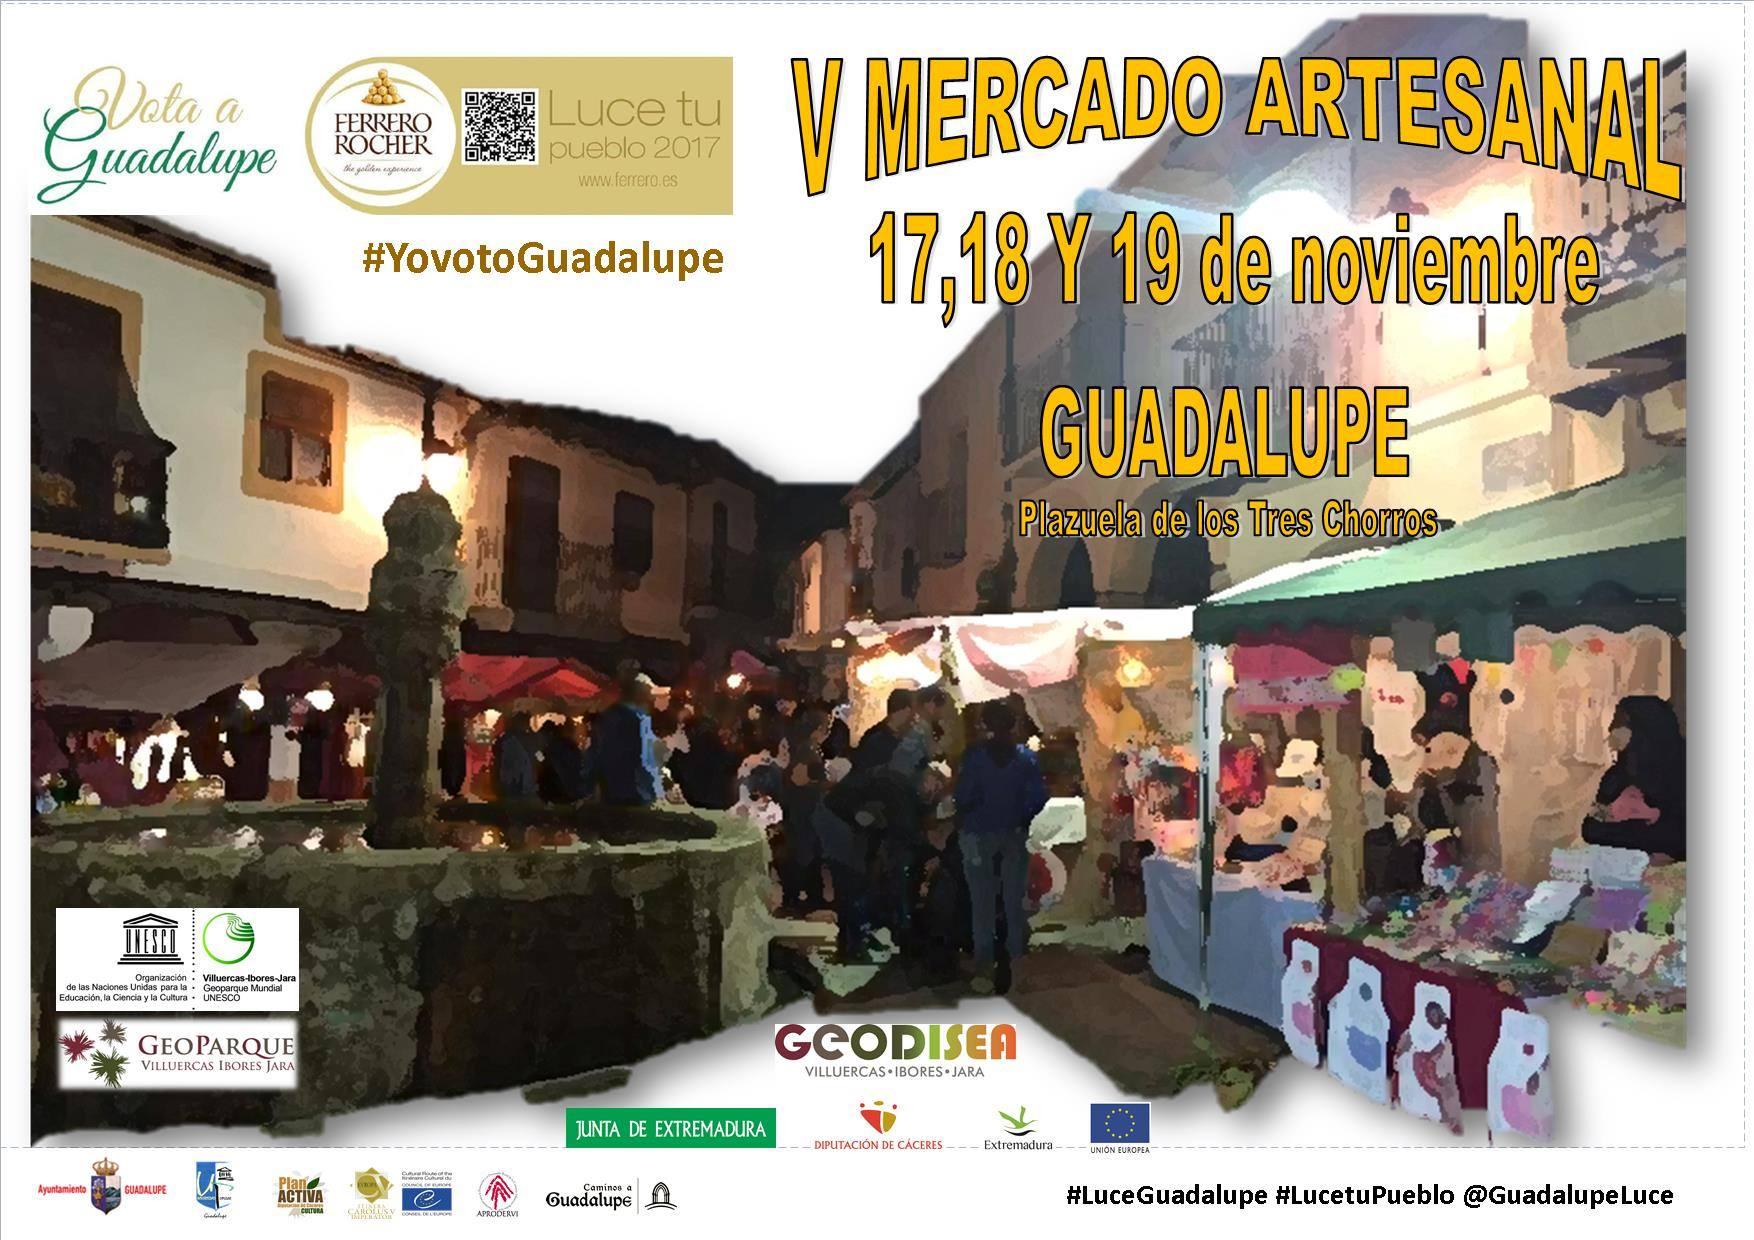 V Mercado Artesanal - Guadalupe